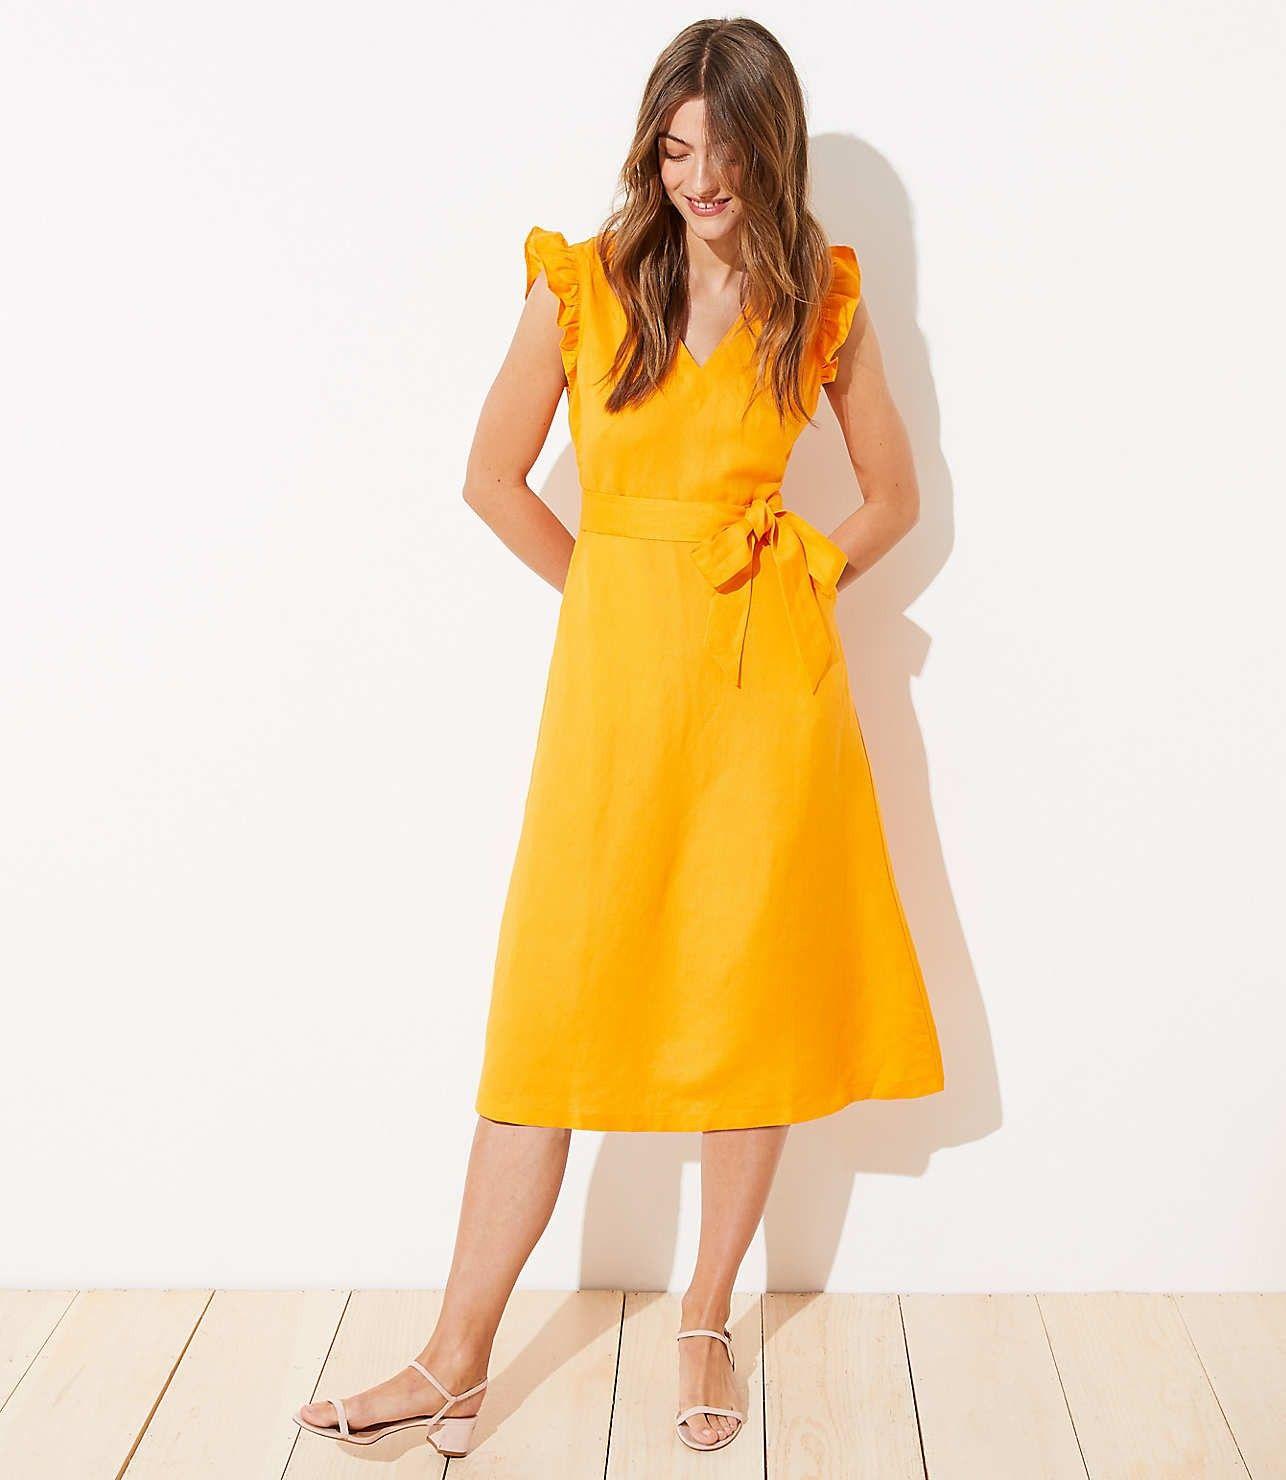 Pin By Angela Allyn On My Style Dresses Printed Leggings Fashion Wool Shift Dress [ 1480 x 1286 Pixel ]